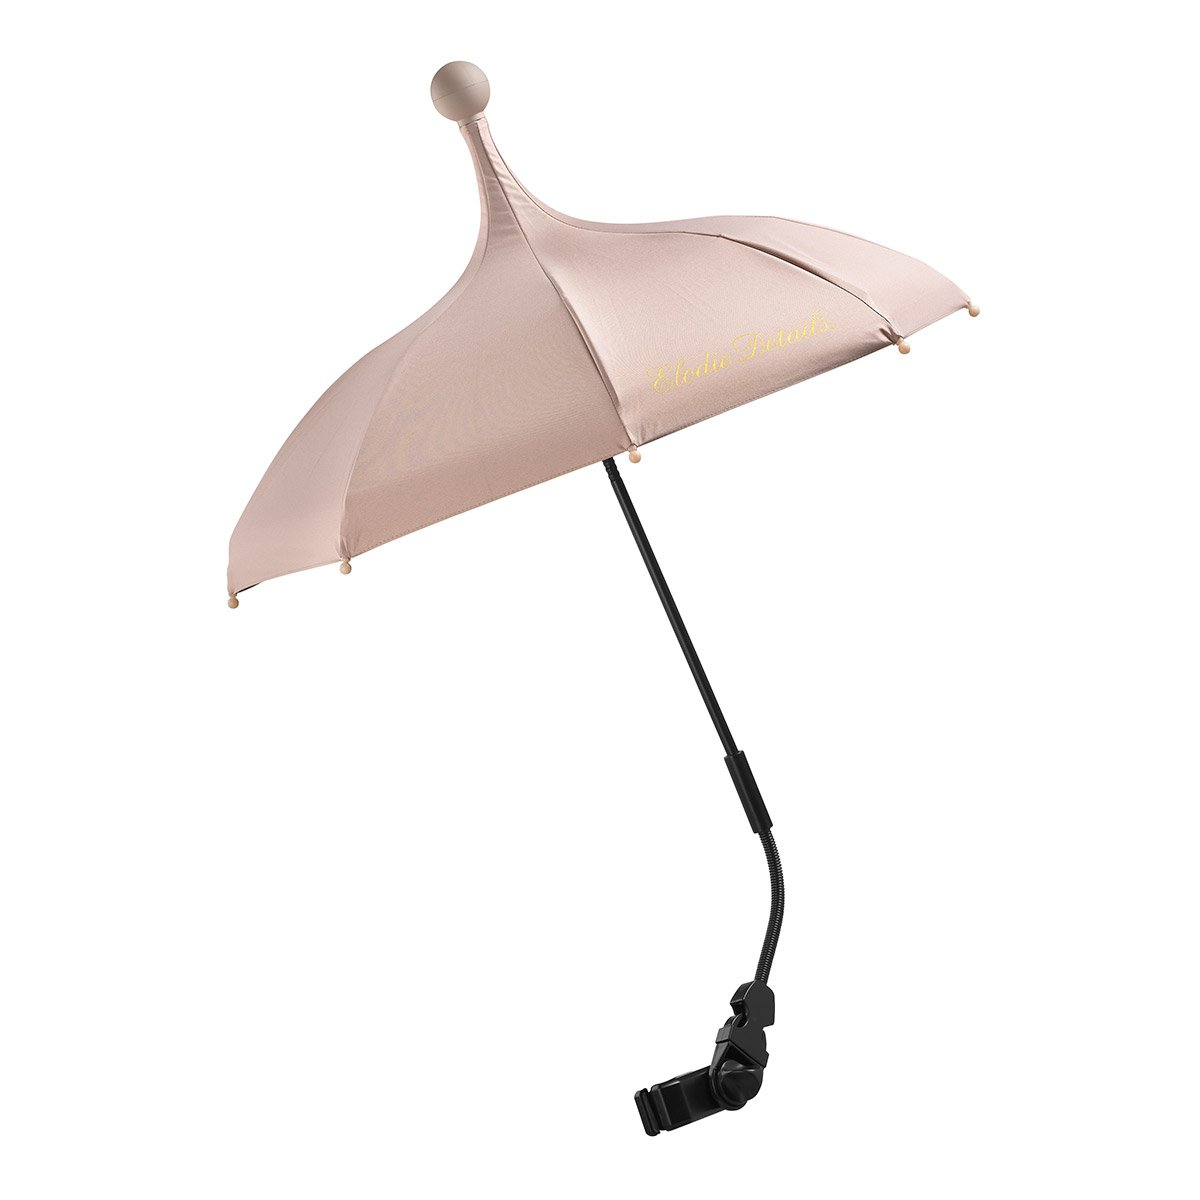 Elodie Details Universal Stroller Parasol, Powder Pink 103807